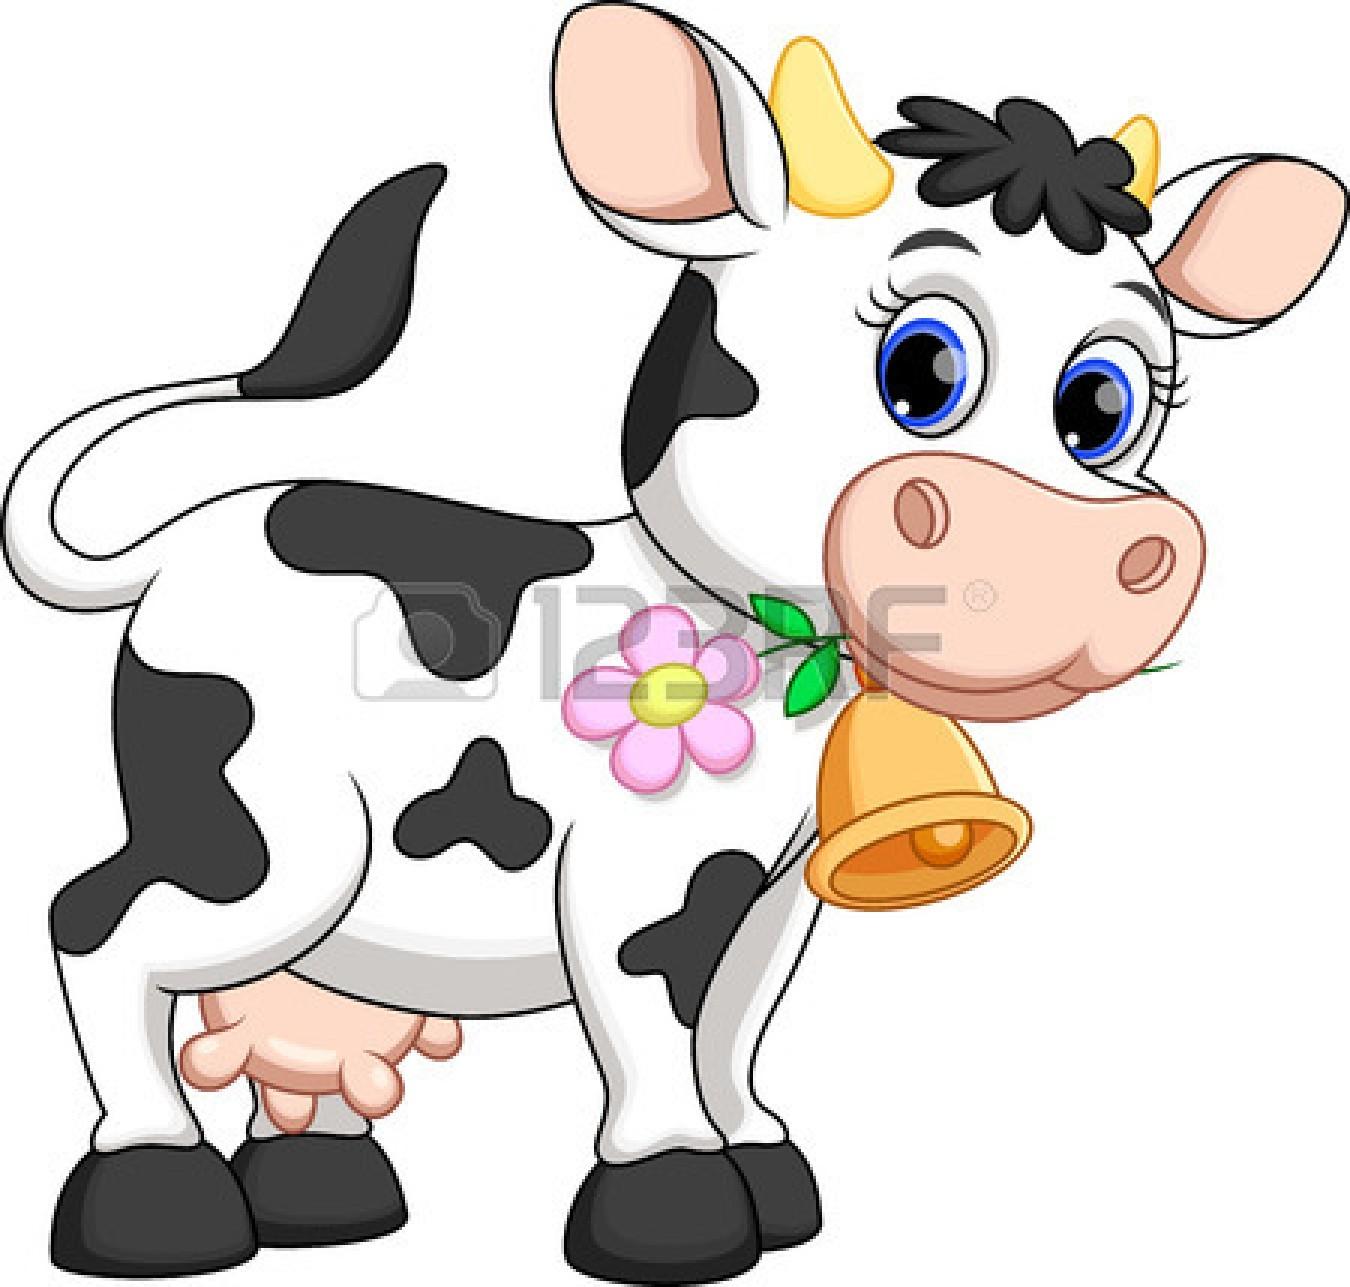 1350x1287 Cute Cow Cartoon Stock Vector